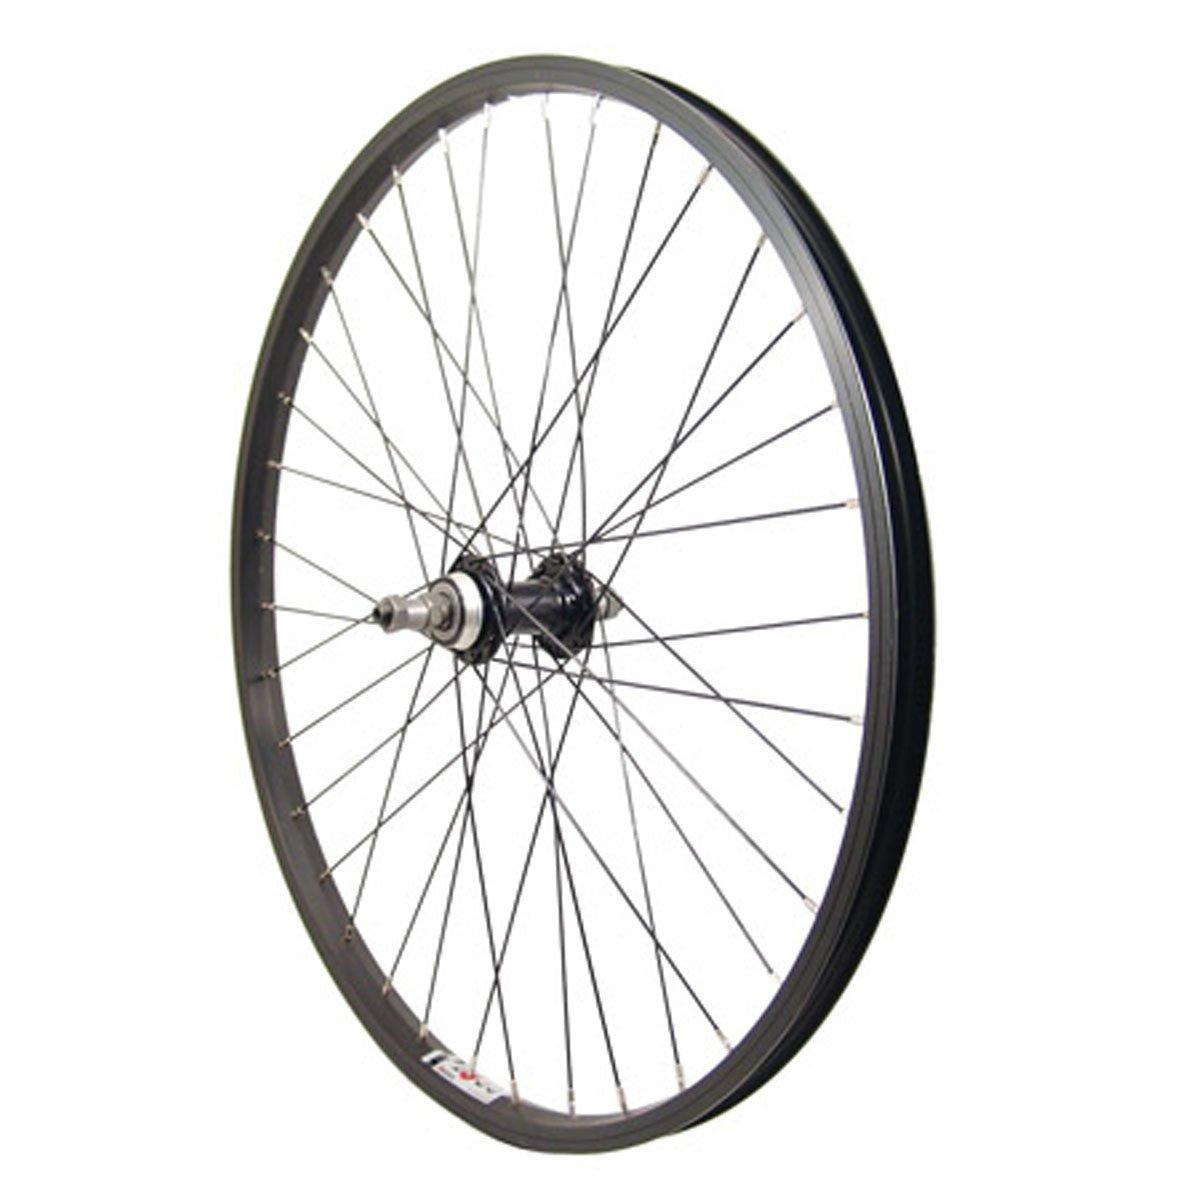 Sta Tru Rear QR 36H Wheel, Black, 24 x 1.5/1.75''